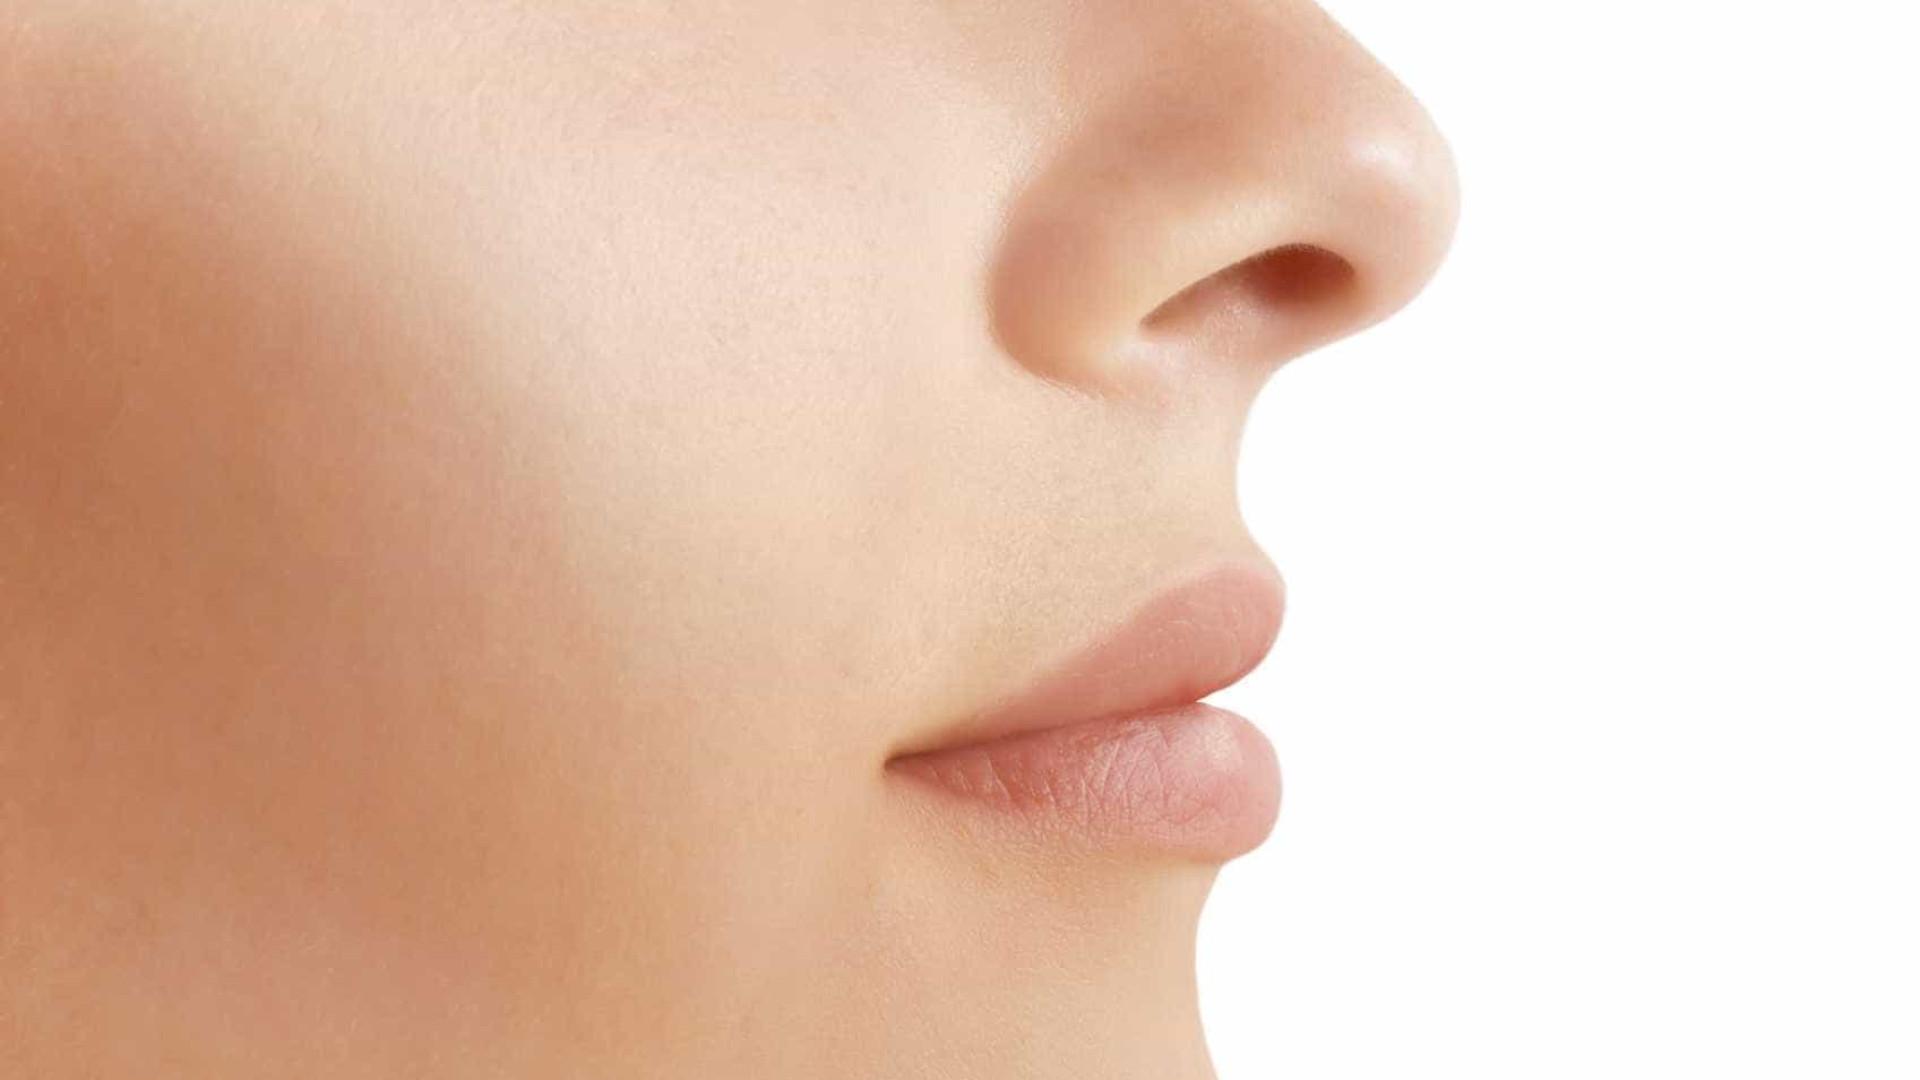 Rinoplastia: especialista esclarece 7 mitos e verdades